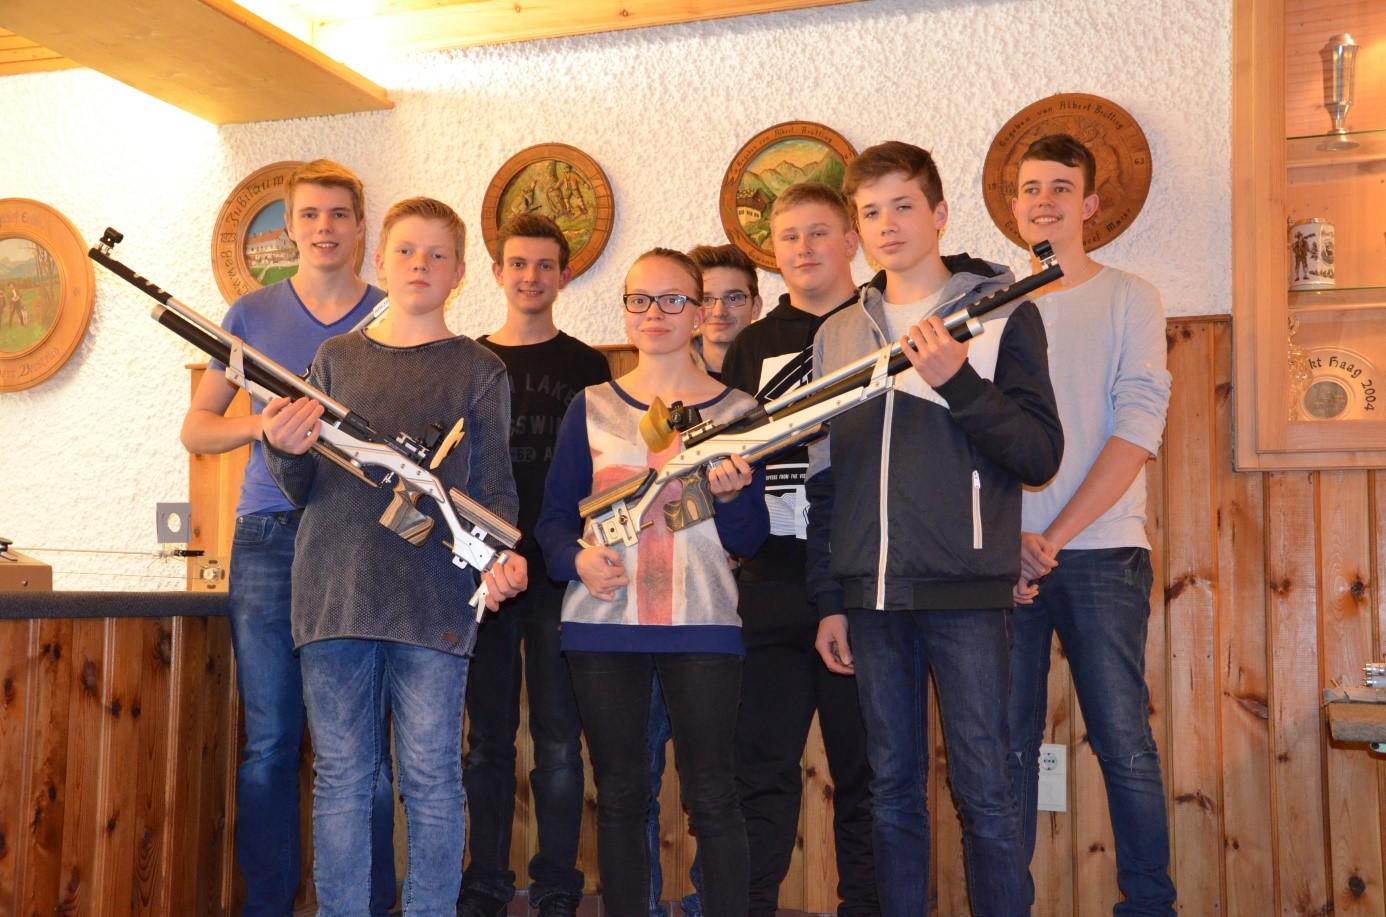 Gruppenfoto Schützenjugend